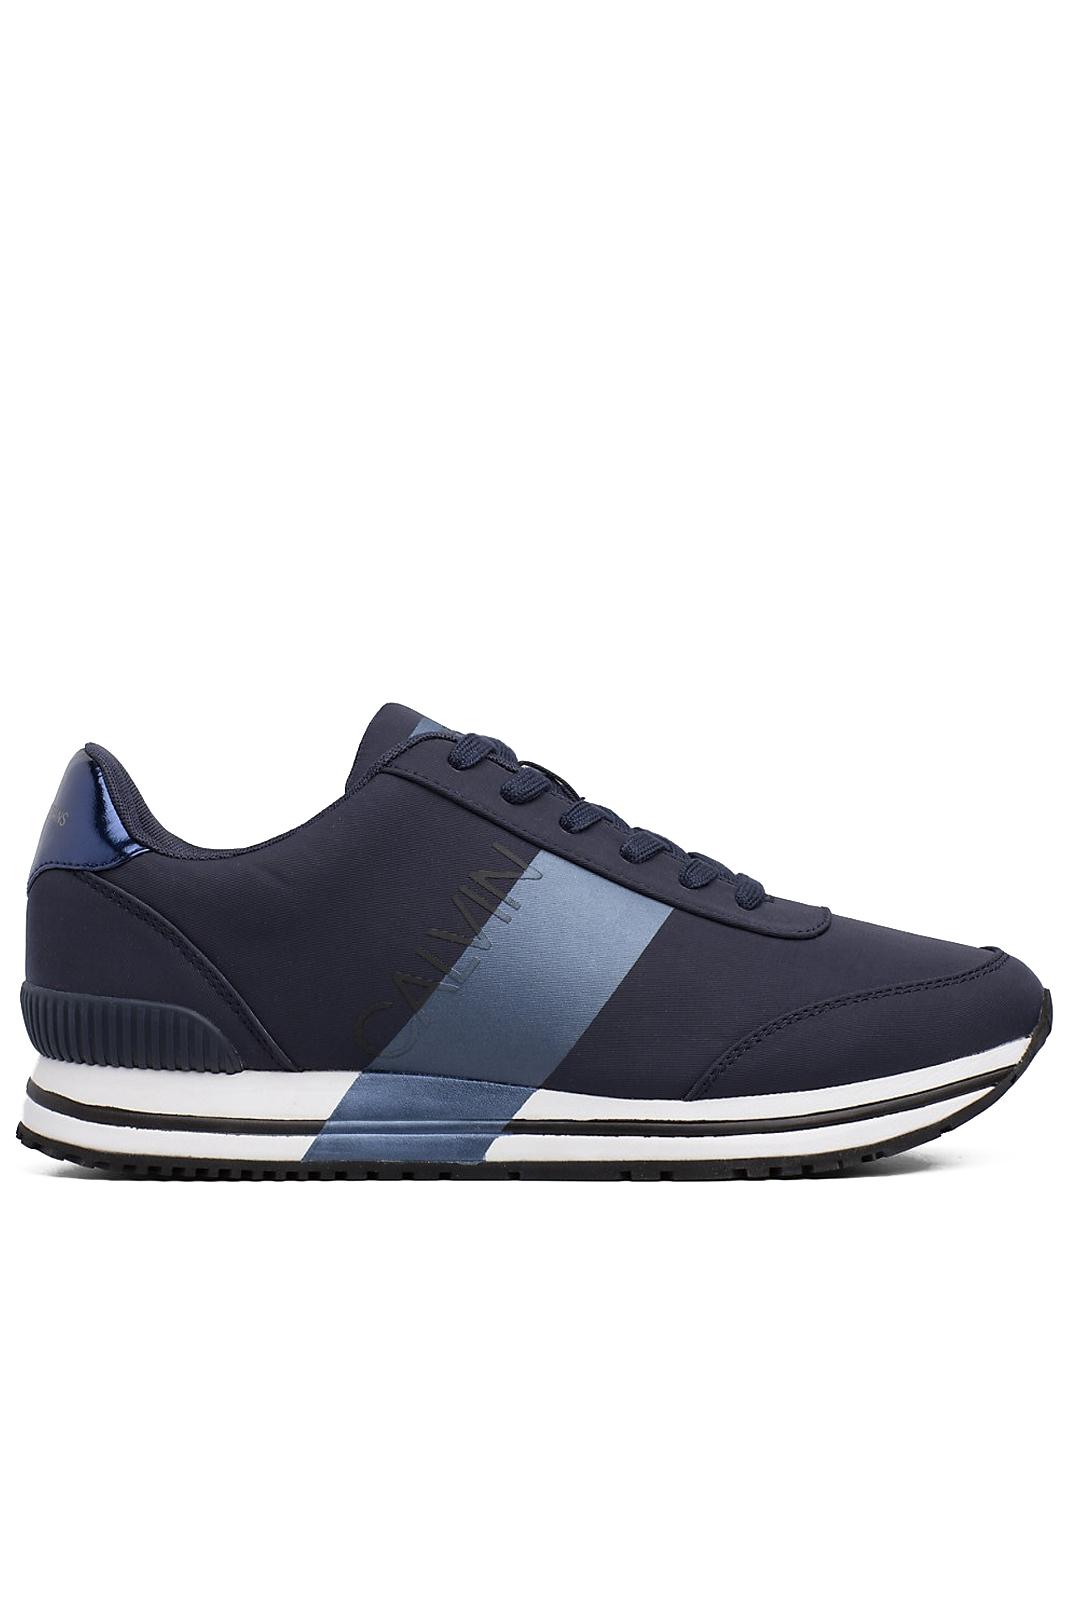 Baskets / Sneakers  Calvin klein ELWIN NYLON NAVY/METAL BLUE